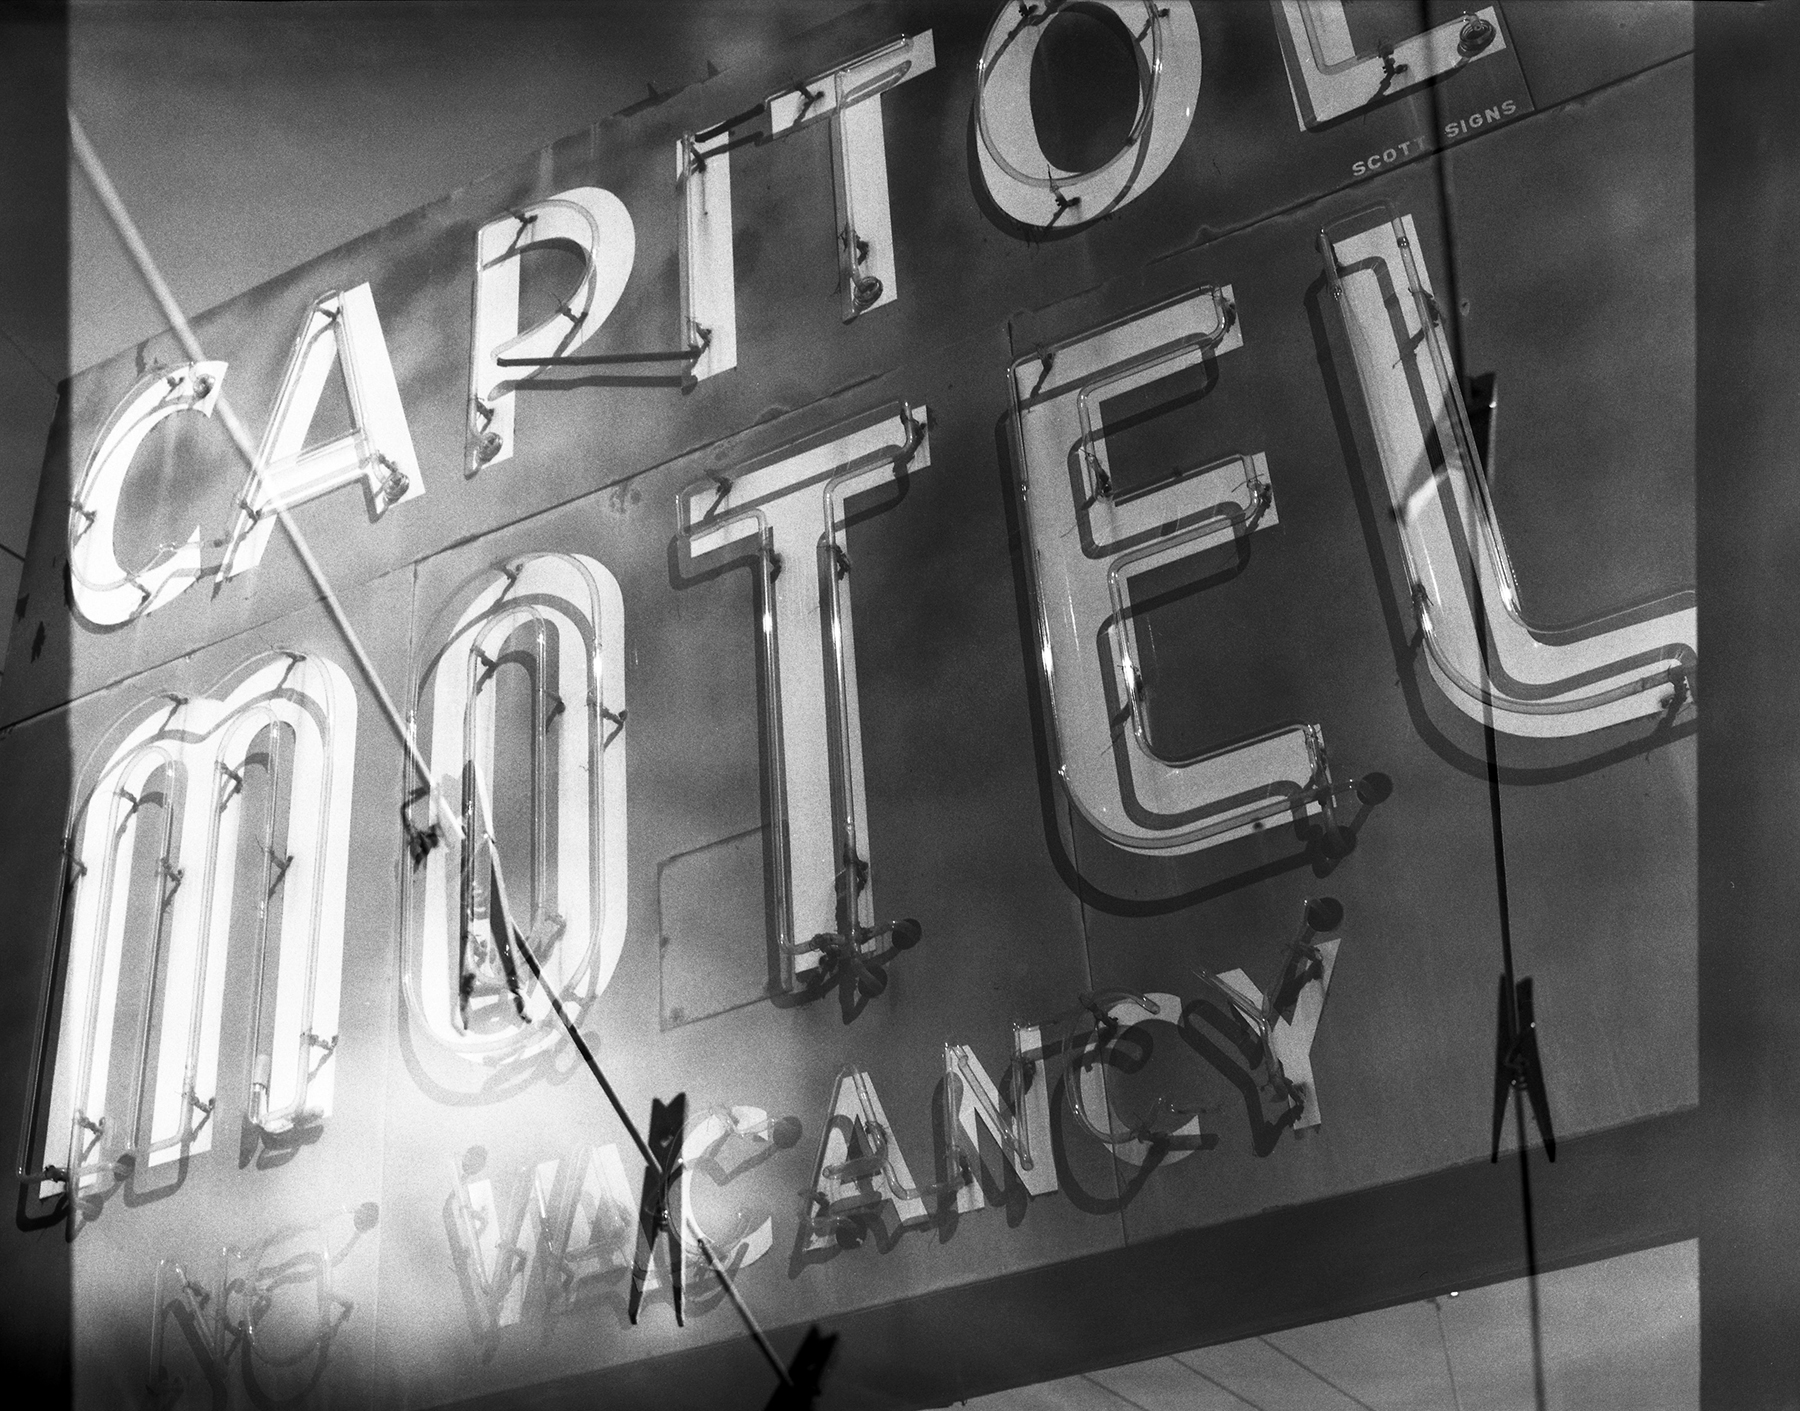 Capitol Motel | Mamiya RB67 ProS | Fuji Neopan Acros 100 | Barbara Justice